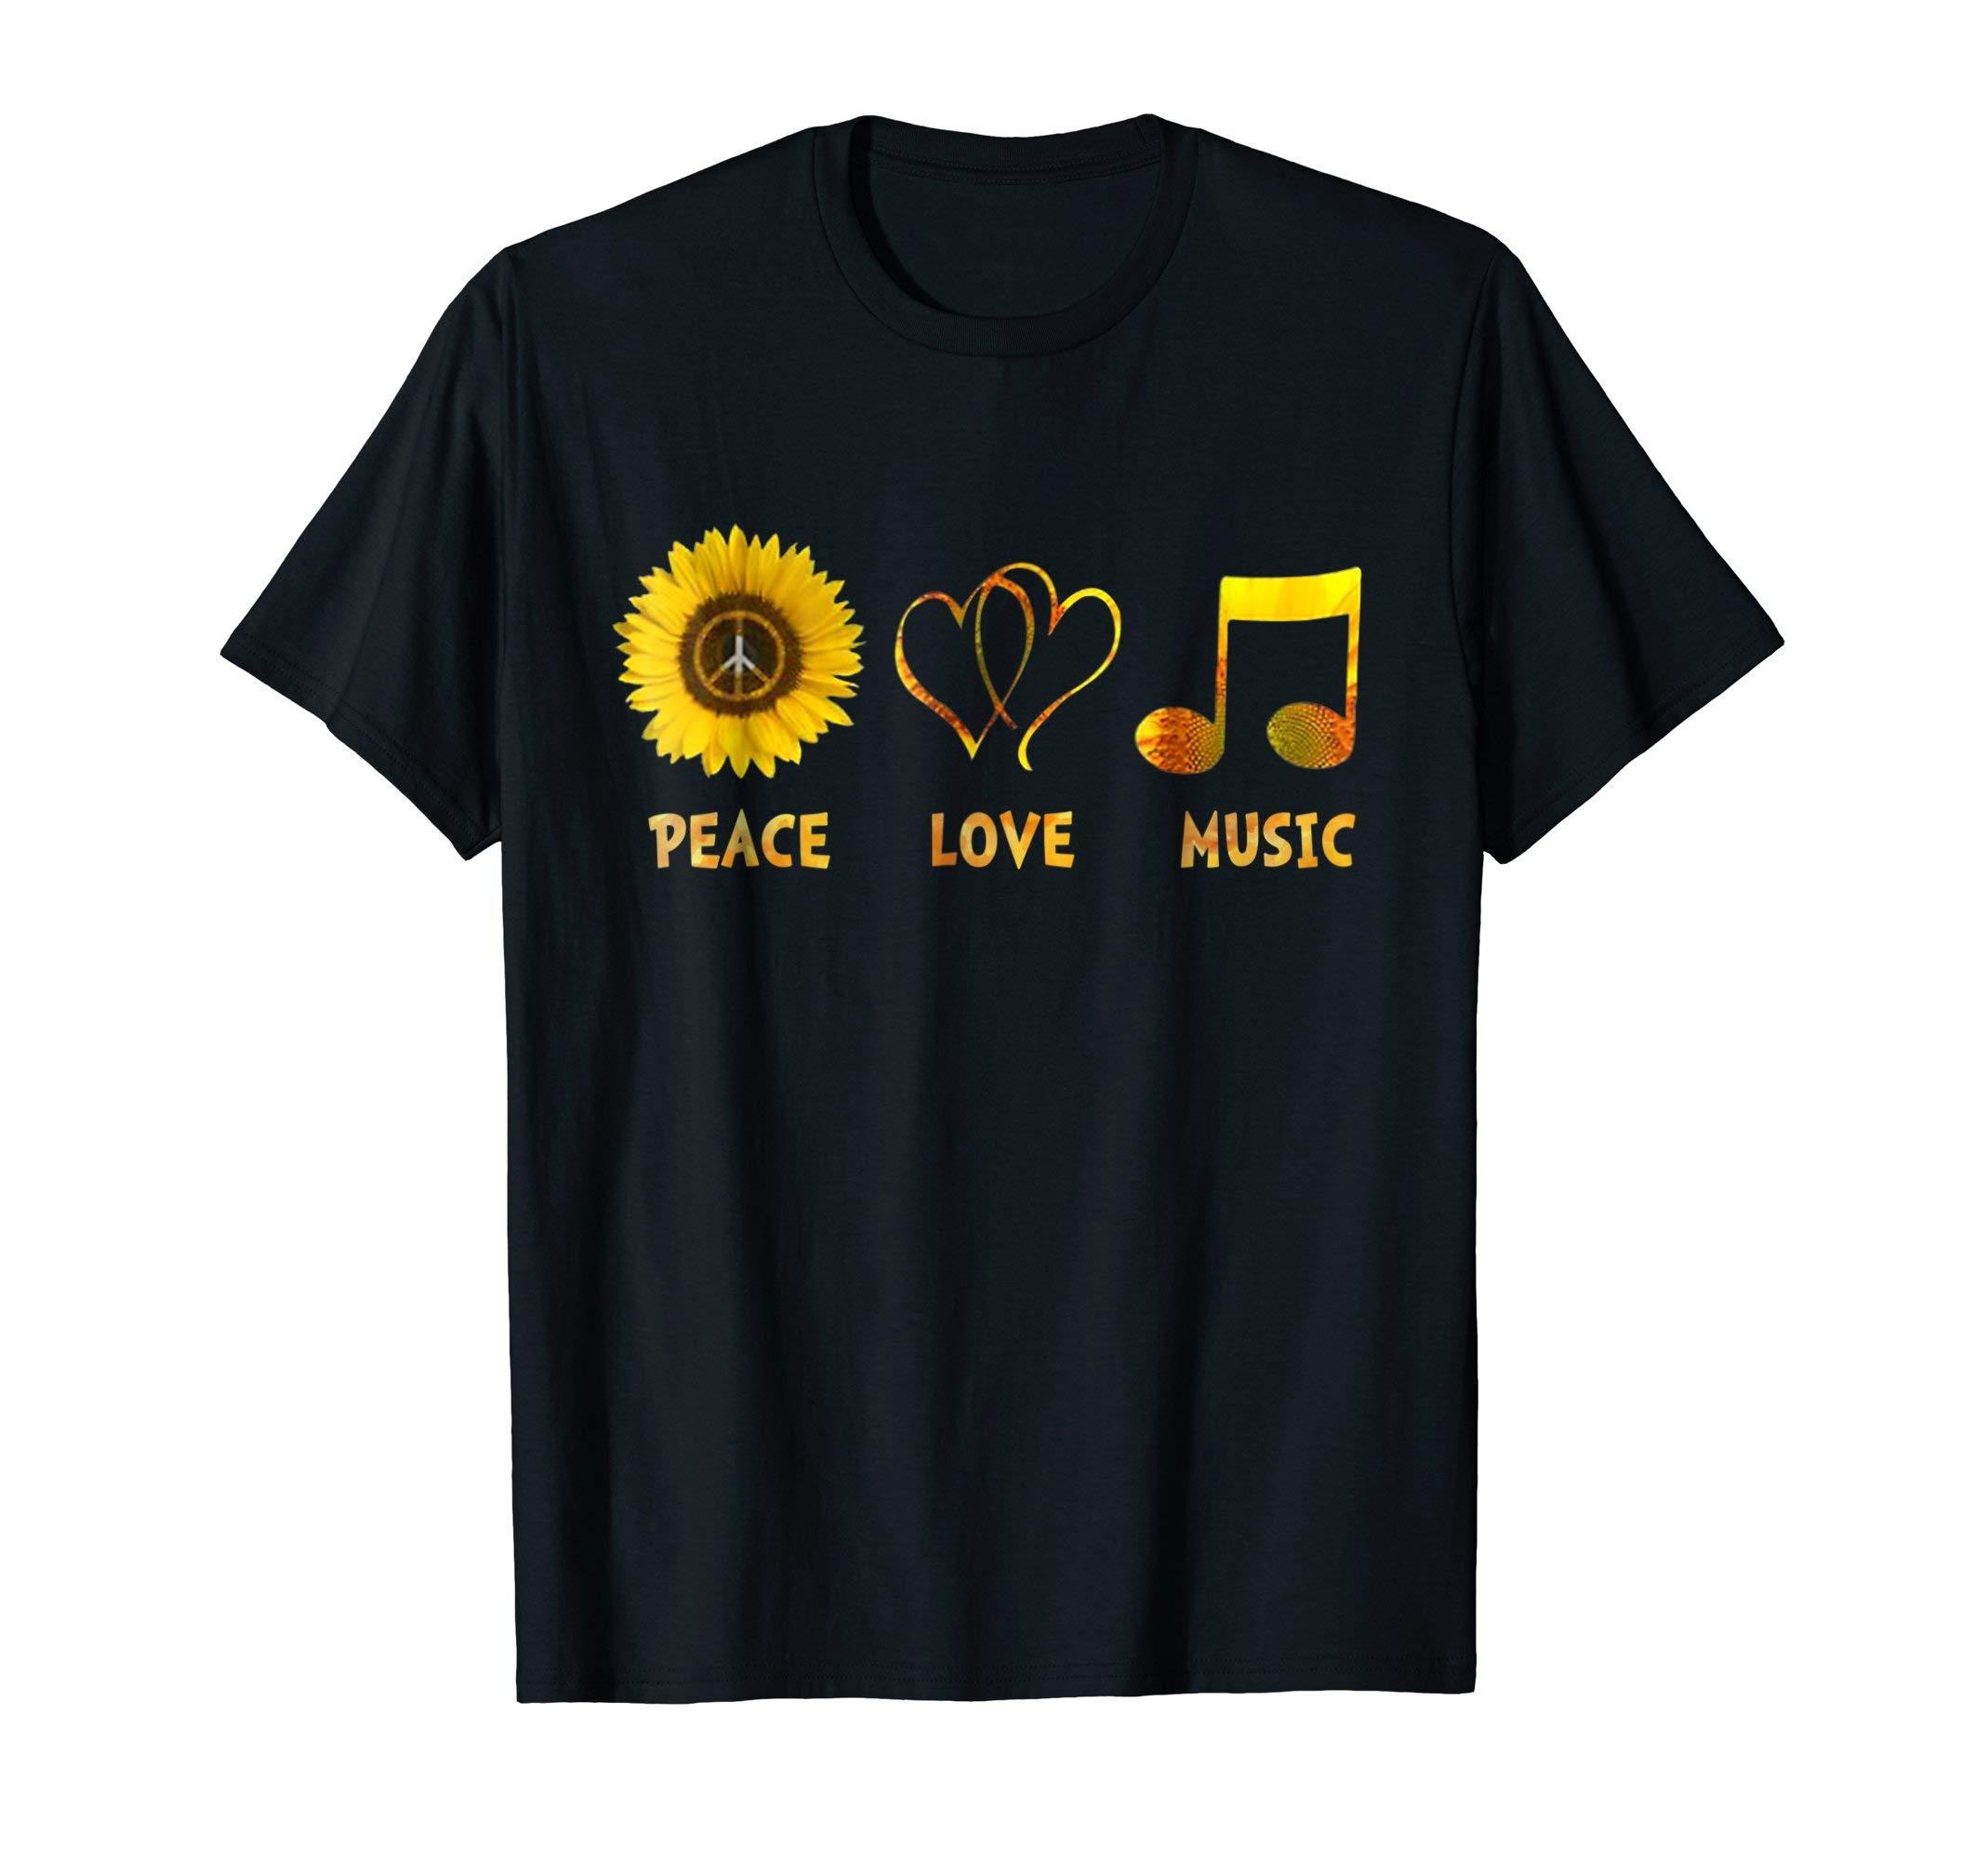 Peace love music hippie sunflower woman casual t-shirt by Peace love hippie t-shirt (Image #1)